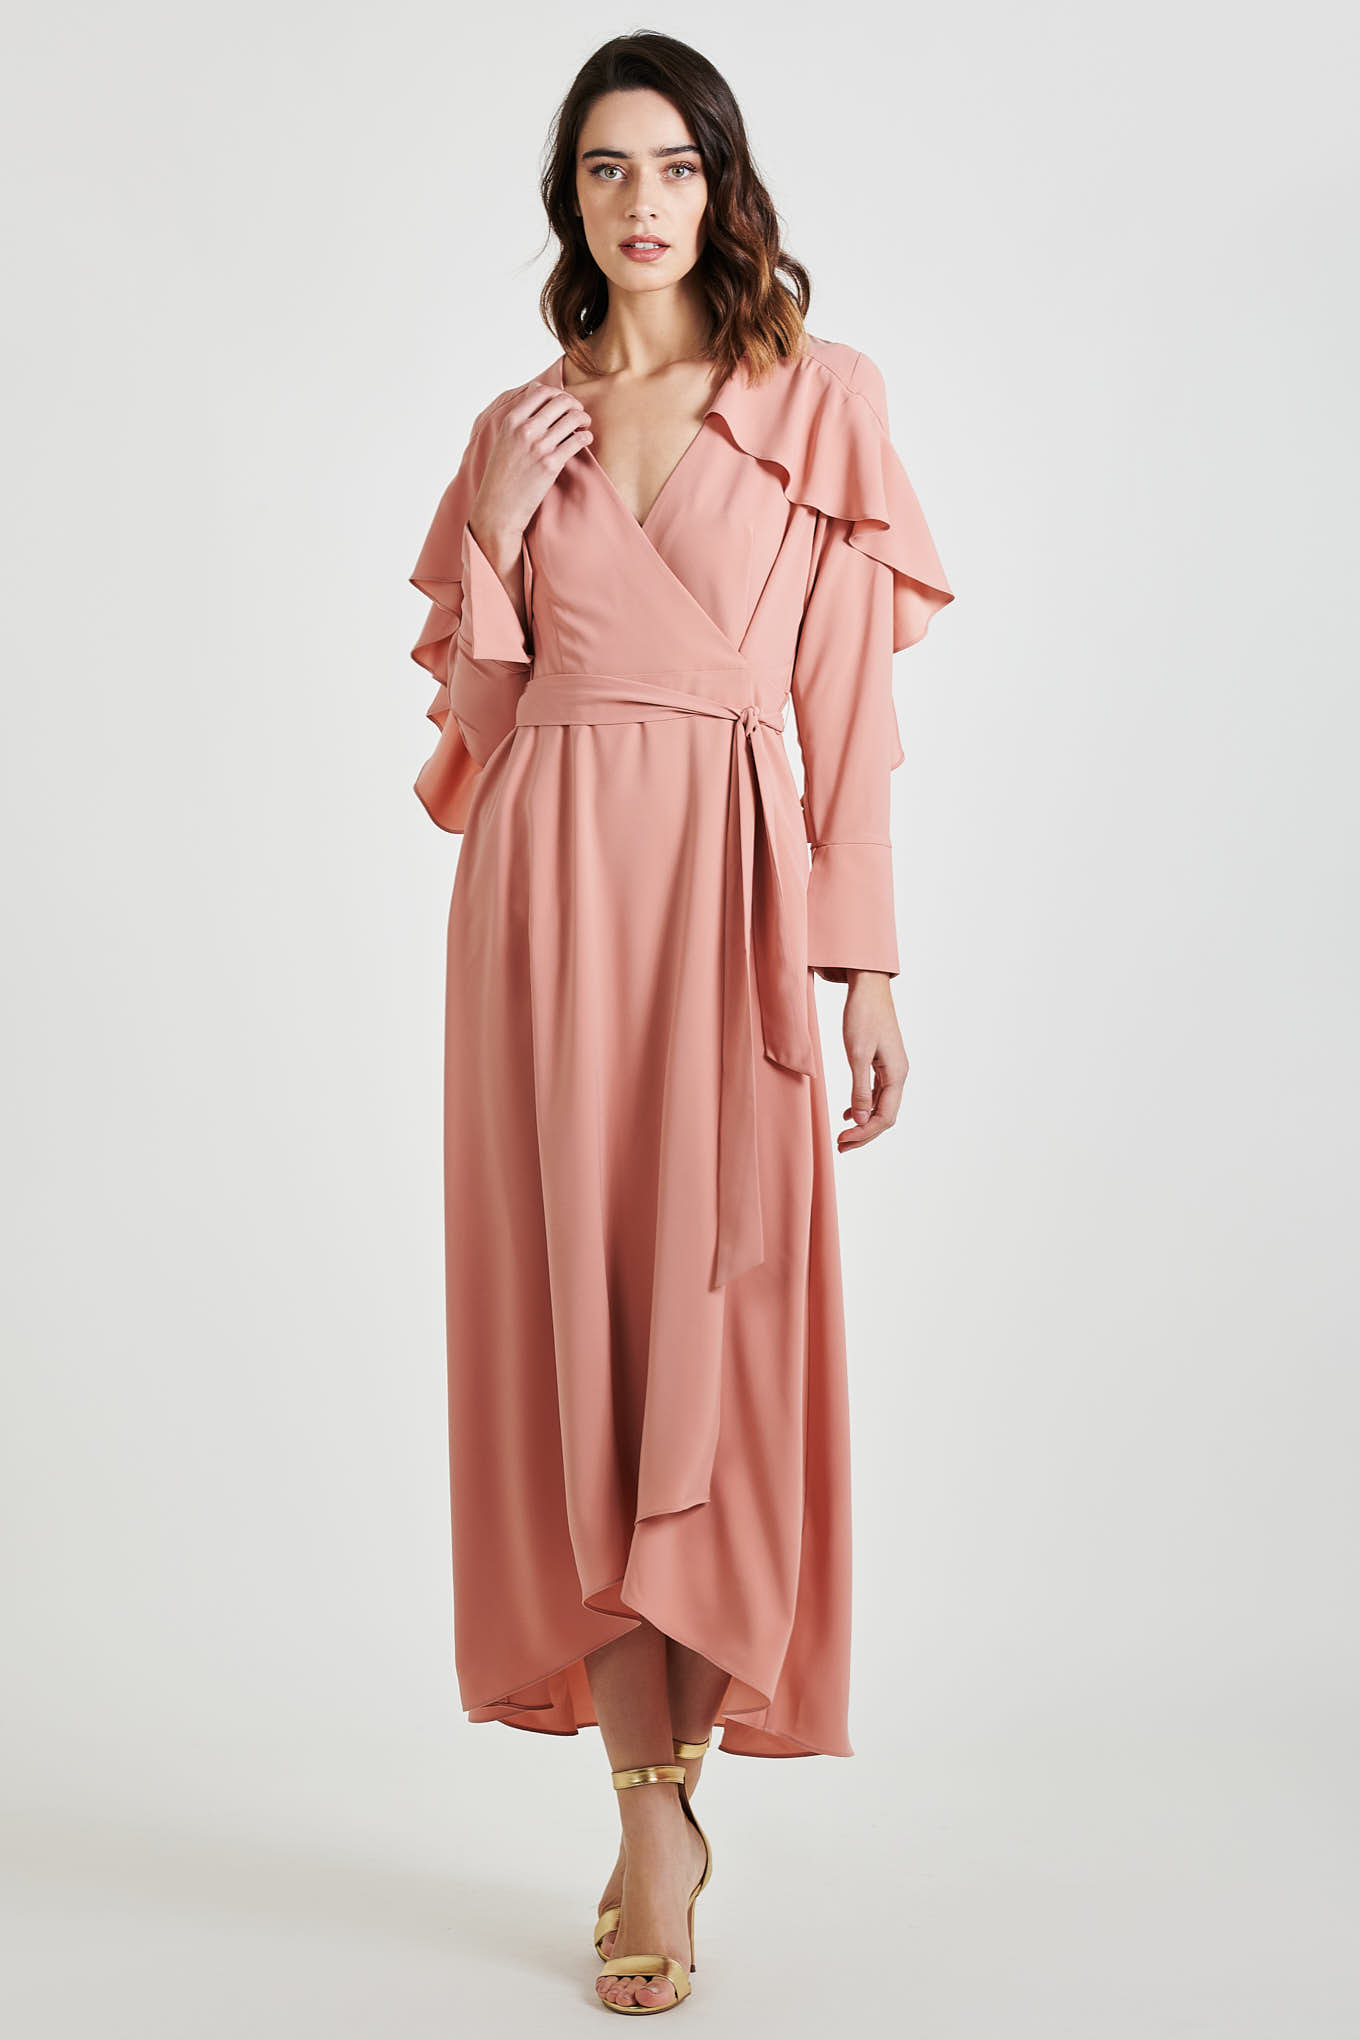 Vestido Rosa Escuro Fantasy Mulher